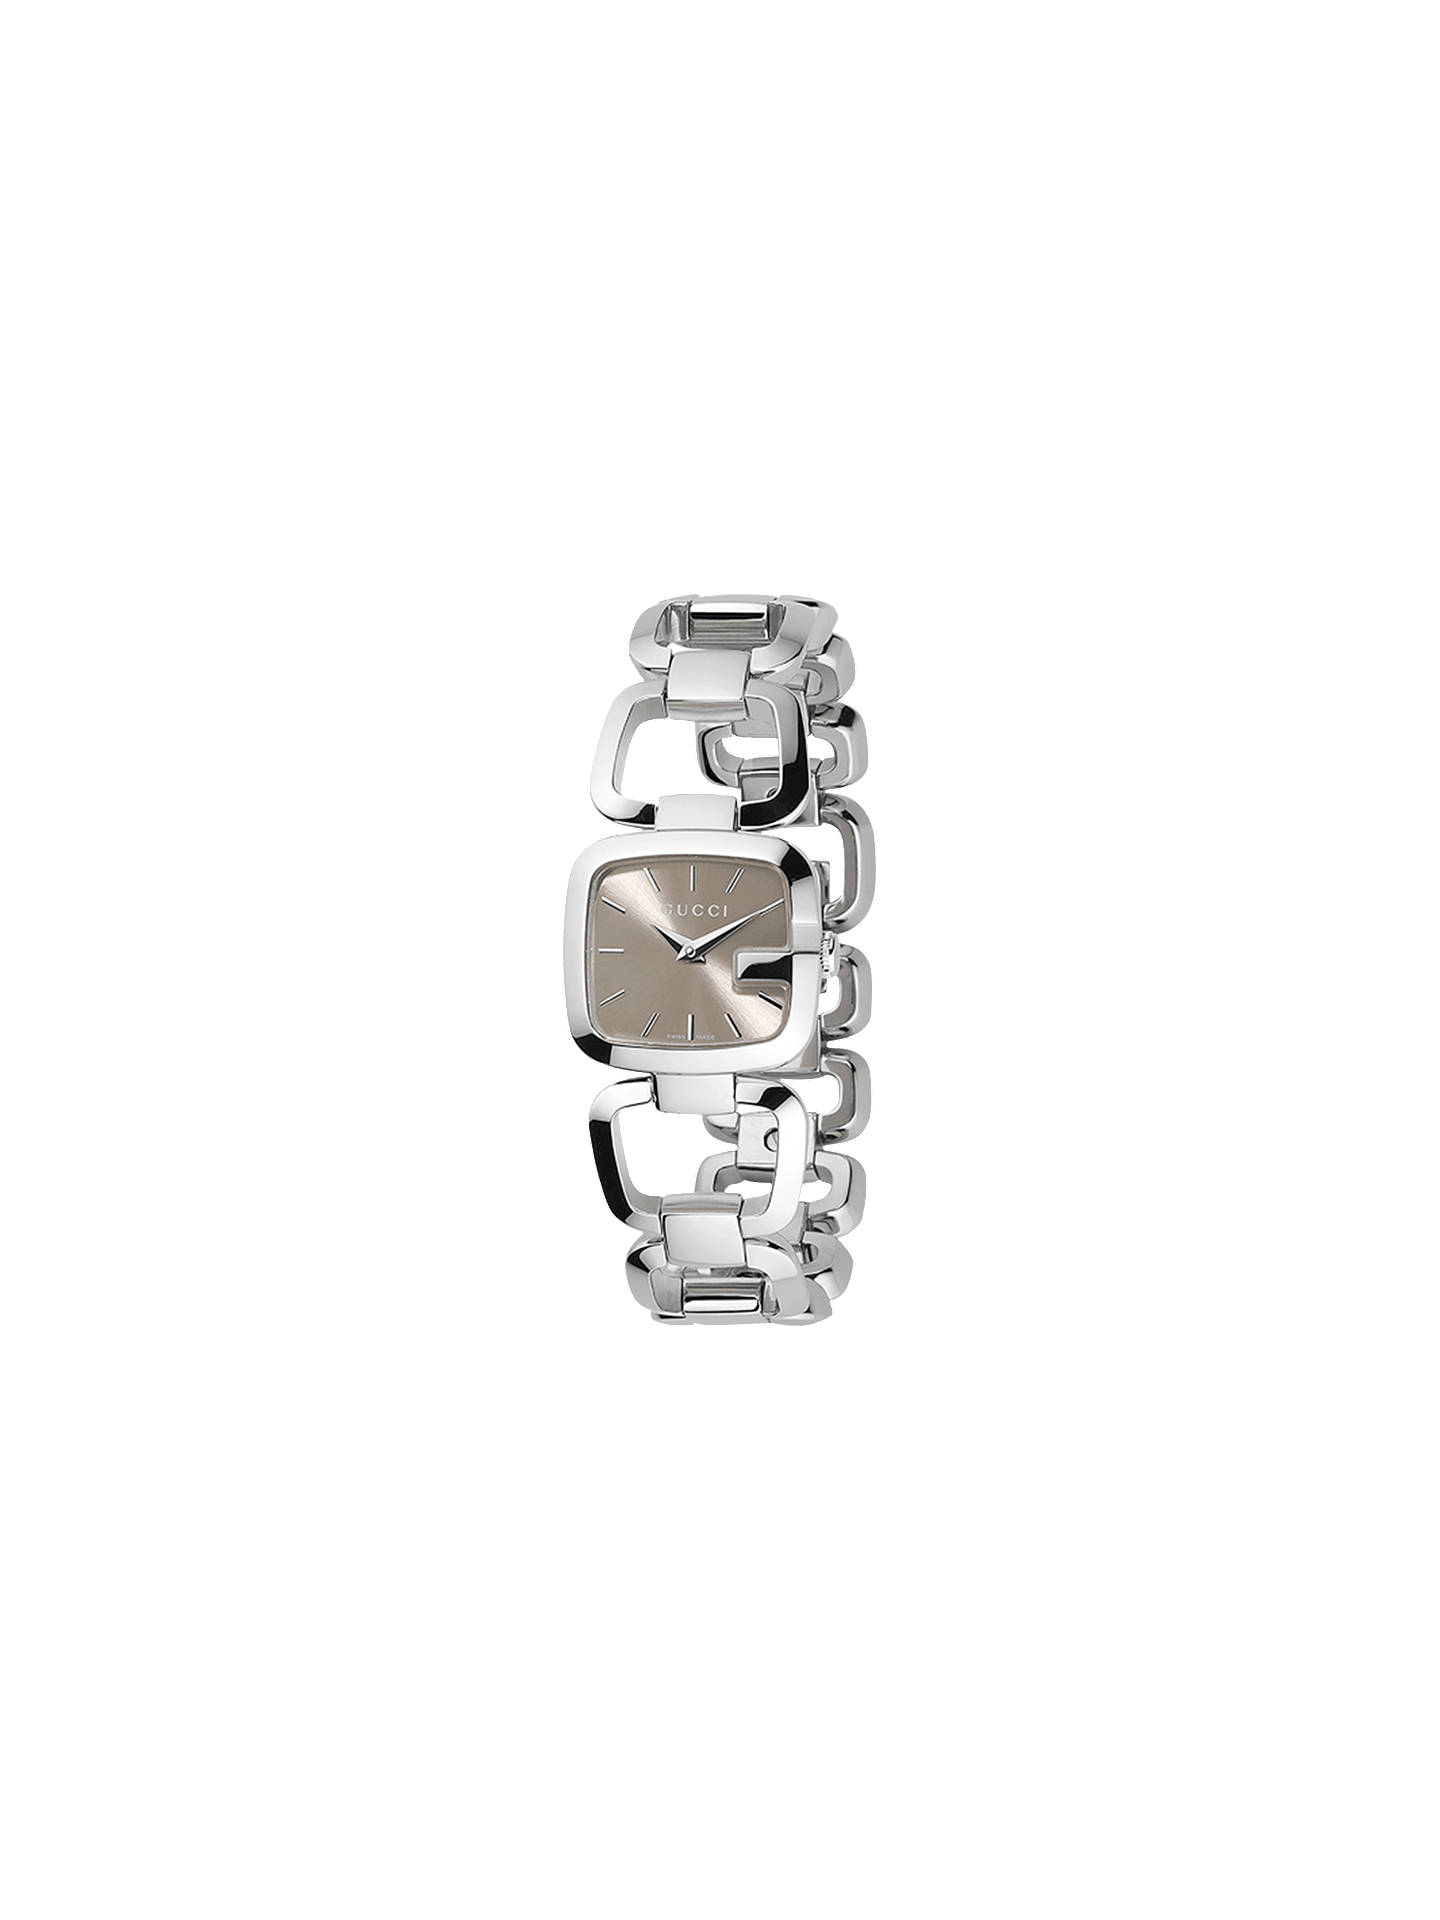 5f401ab7b40 Buy Gucci YA125507 Women s G-Gucci Brown Square Dial Bracelet Strap Watch